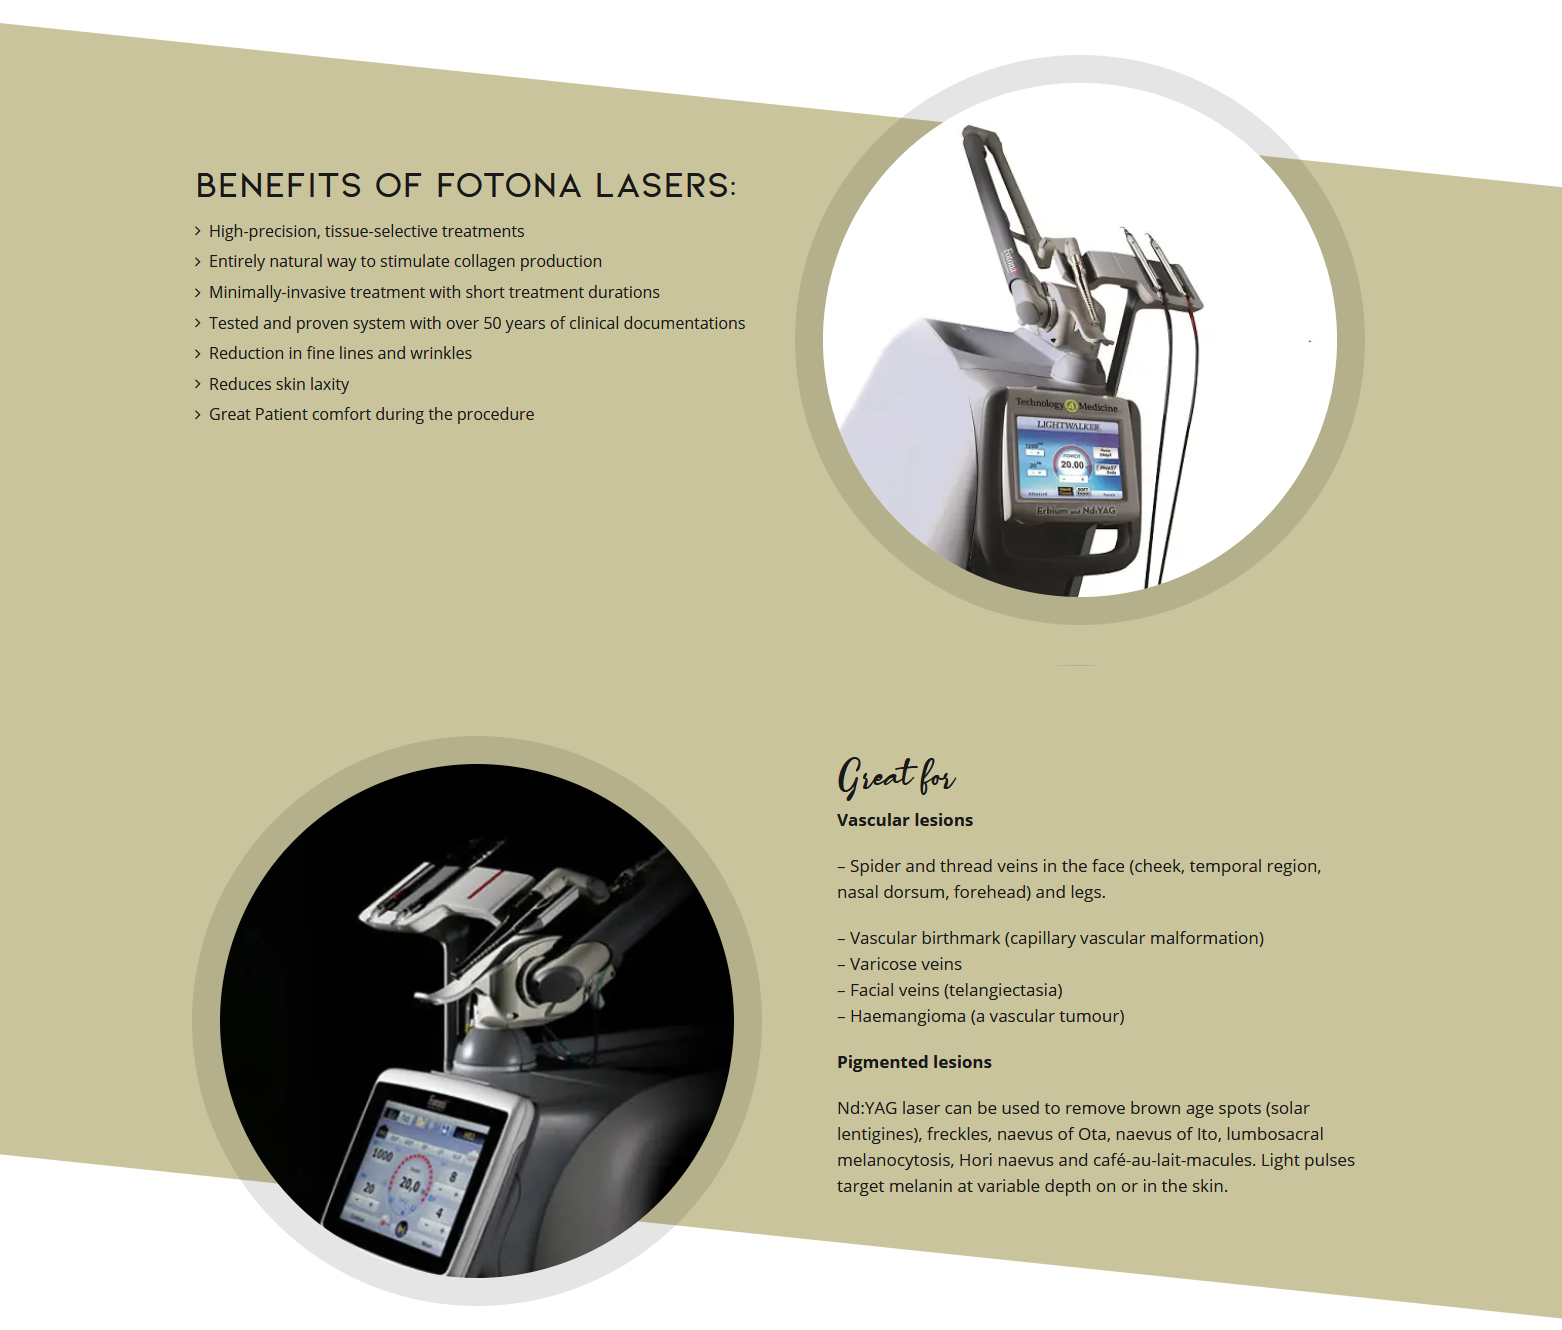 Benefits of FOTONA Lasers